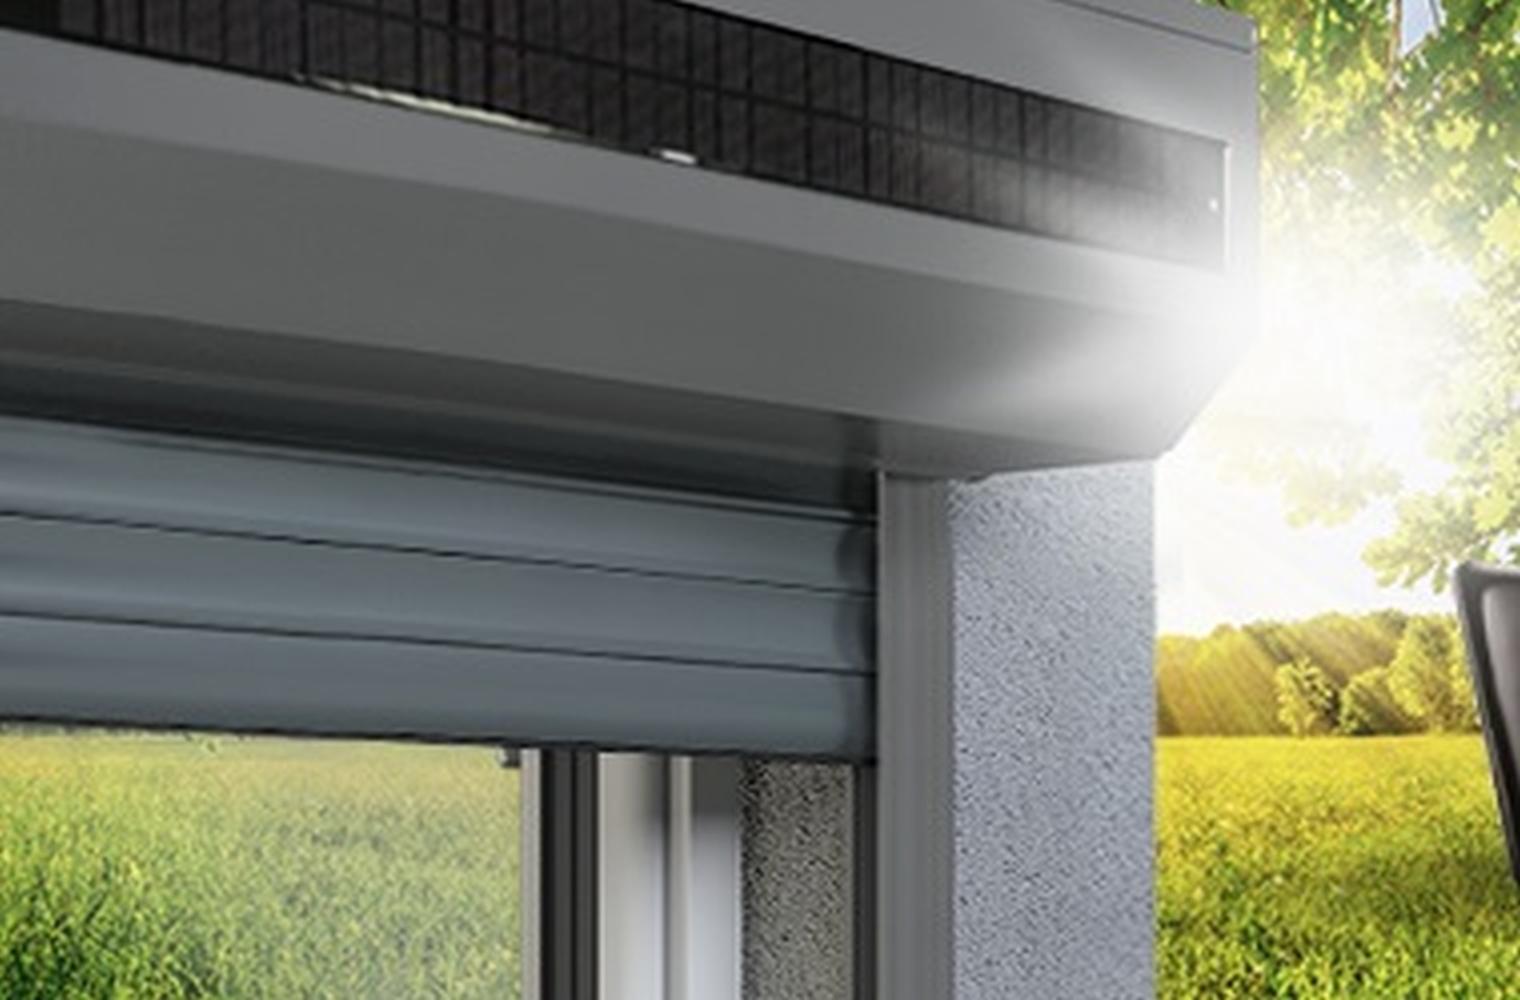 Solar Rollladen Einmal Investieren Langfristig Sparen Fensterblick De